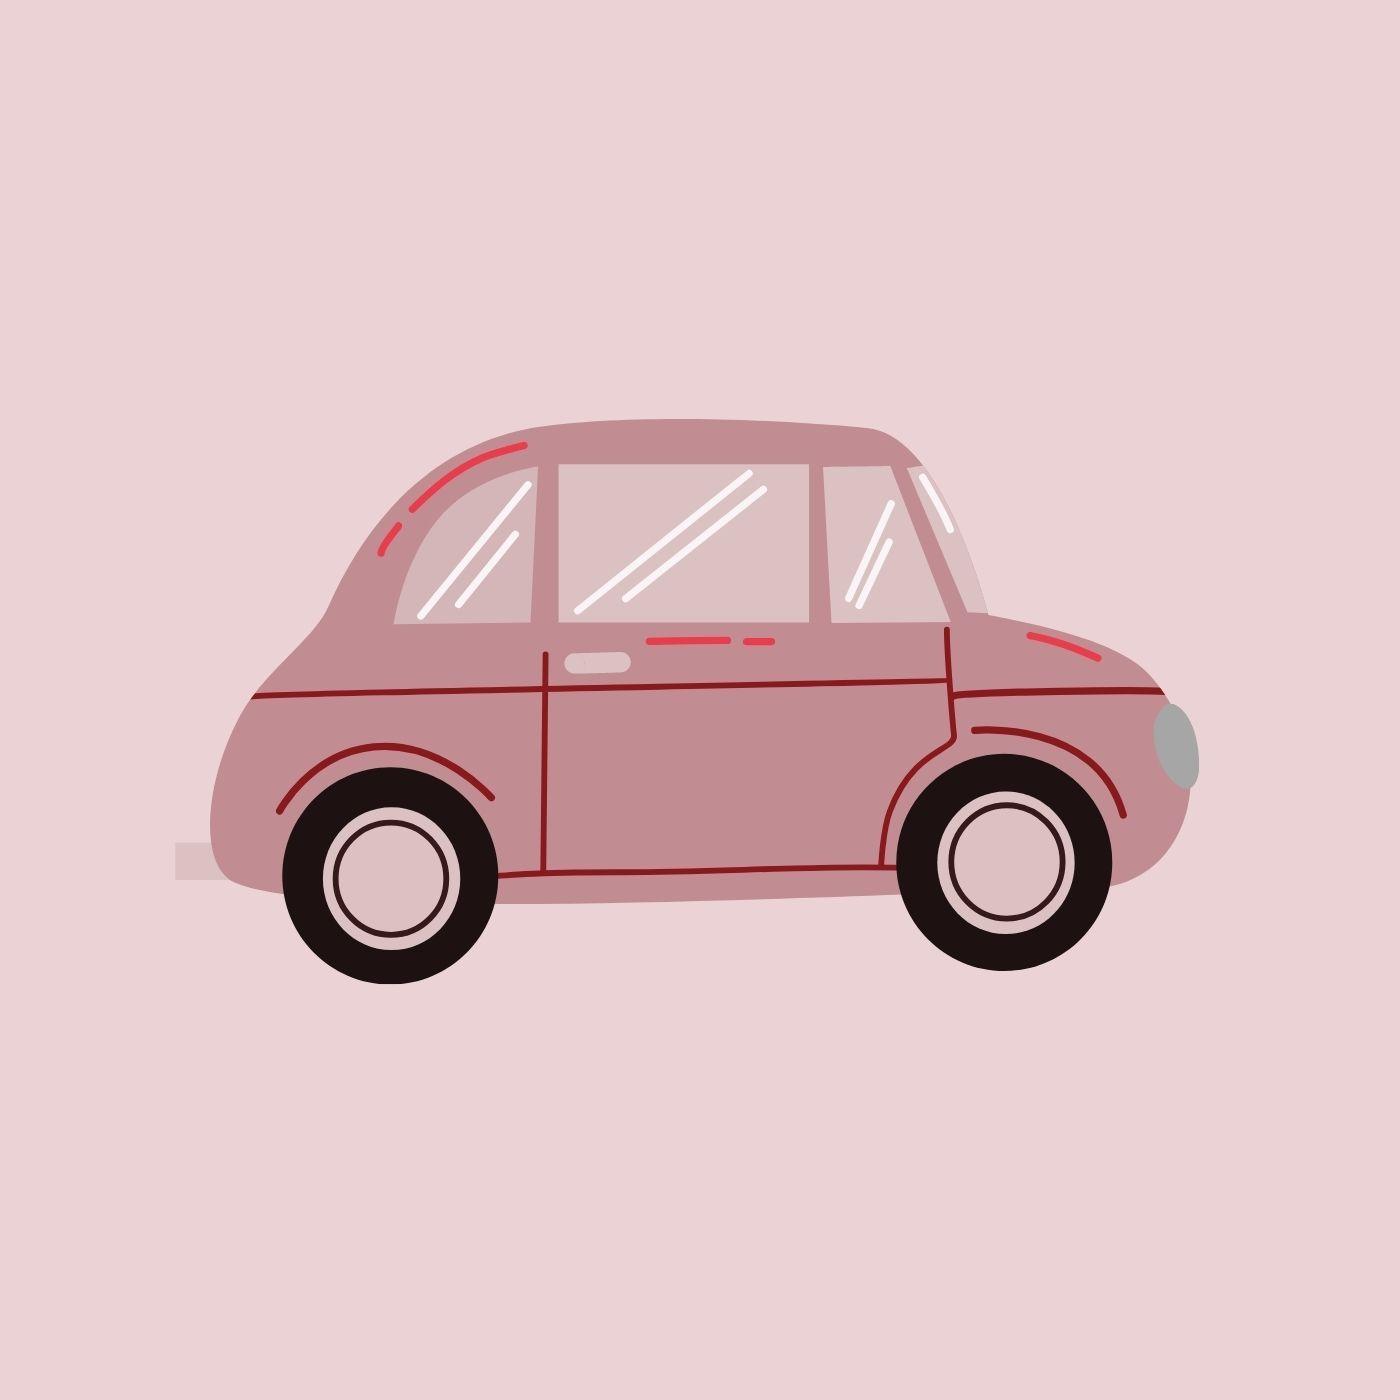 Uber Or Car App Cover Car App App Covers Ios App Icon